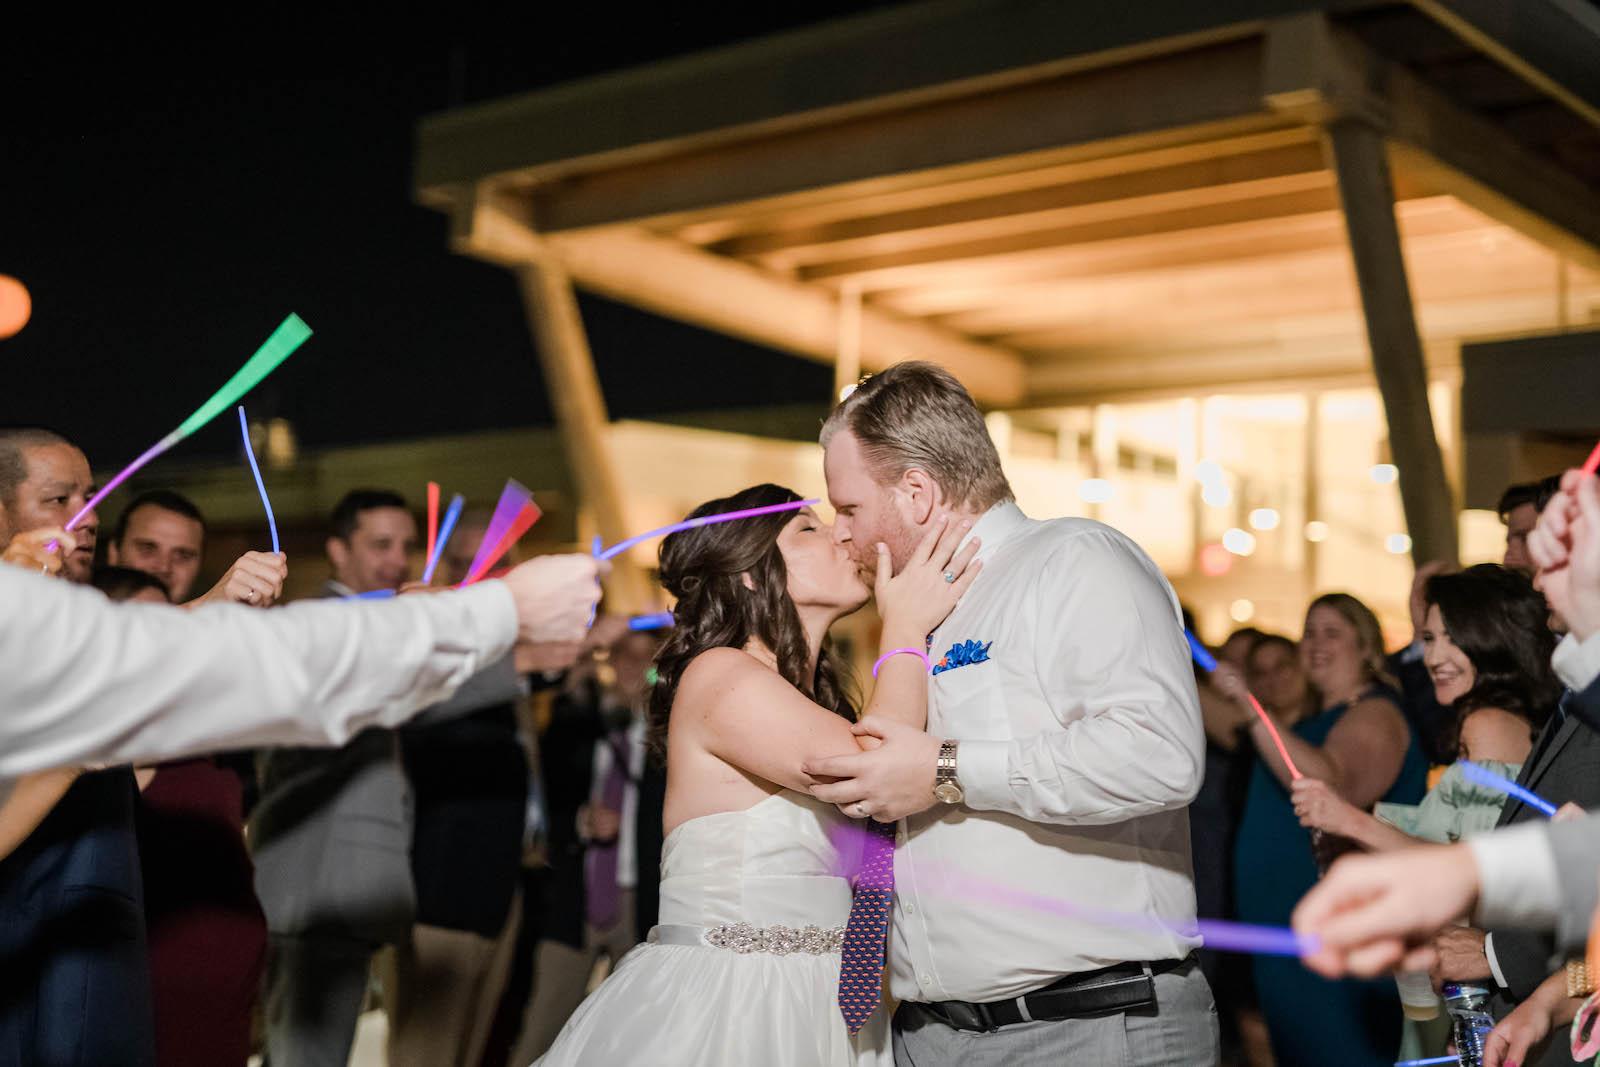 Fun Bride and Groom Glow Sticks Wedding Exit Photo